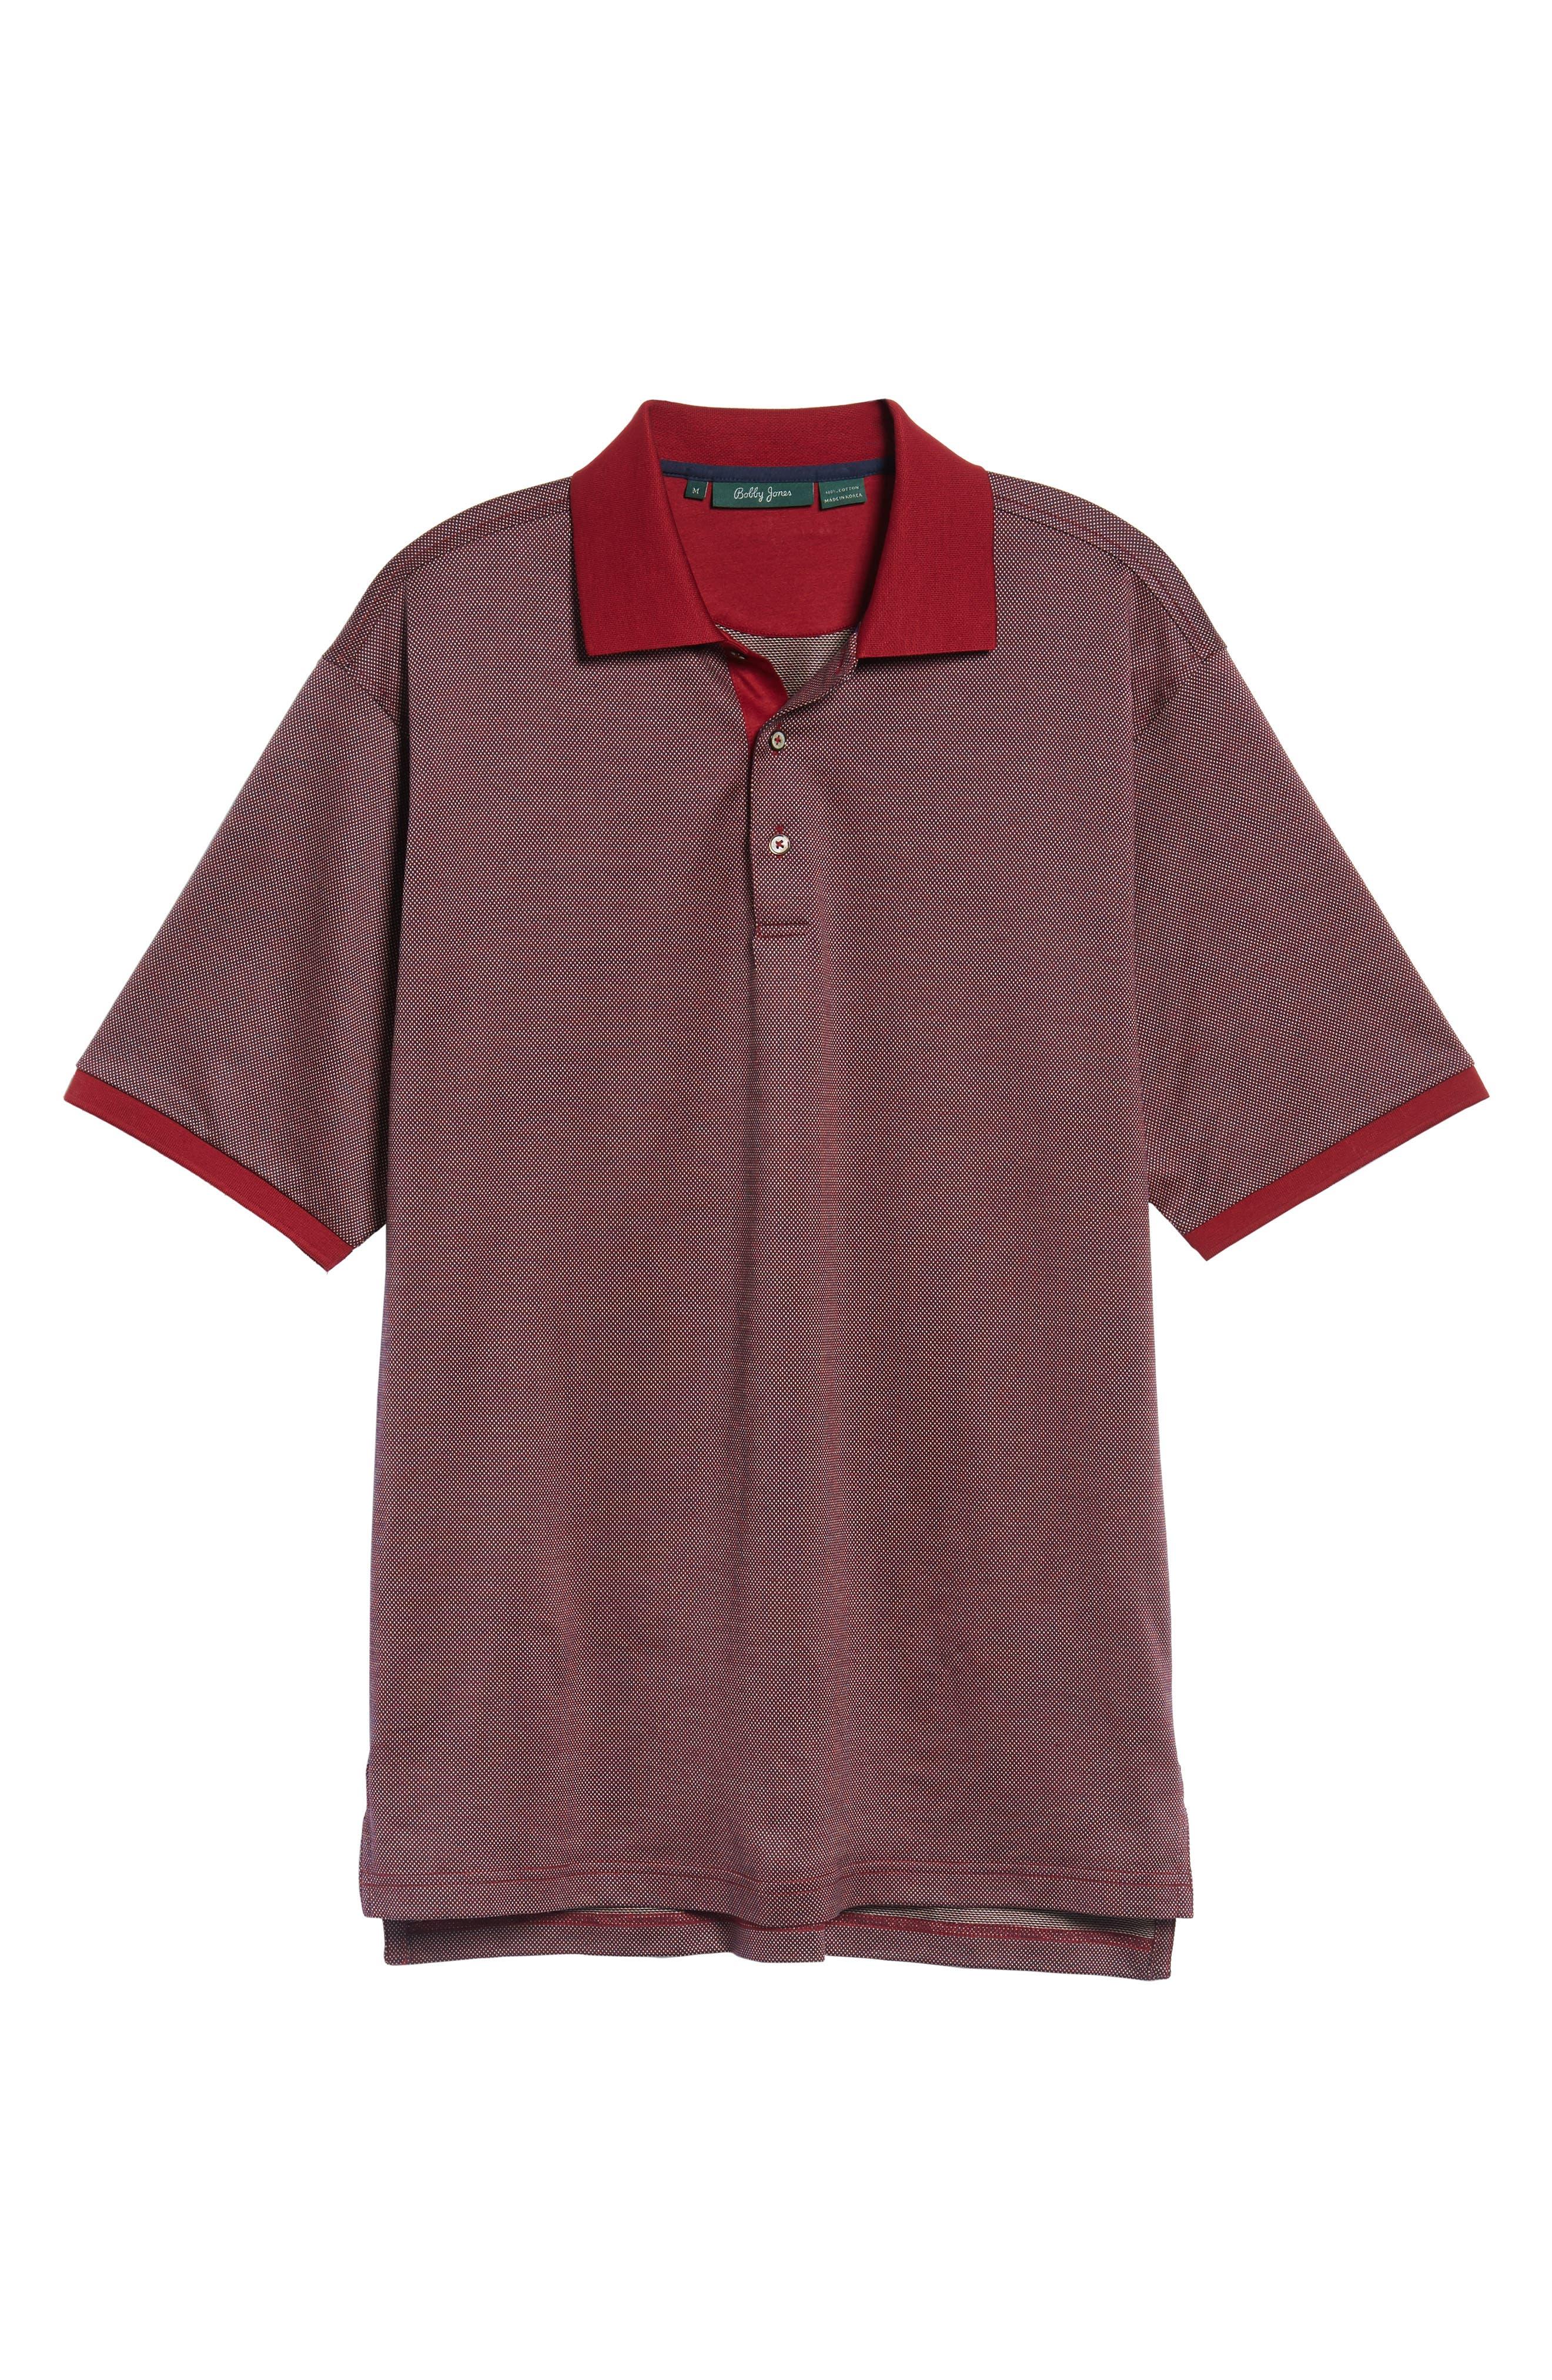 Verde Jacquard Mercerized Cotton Polo,                             Main thumbnail 1, color,                             Brick Red